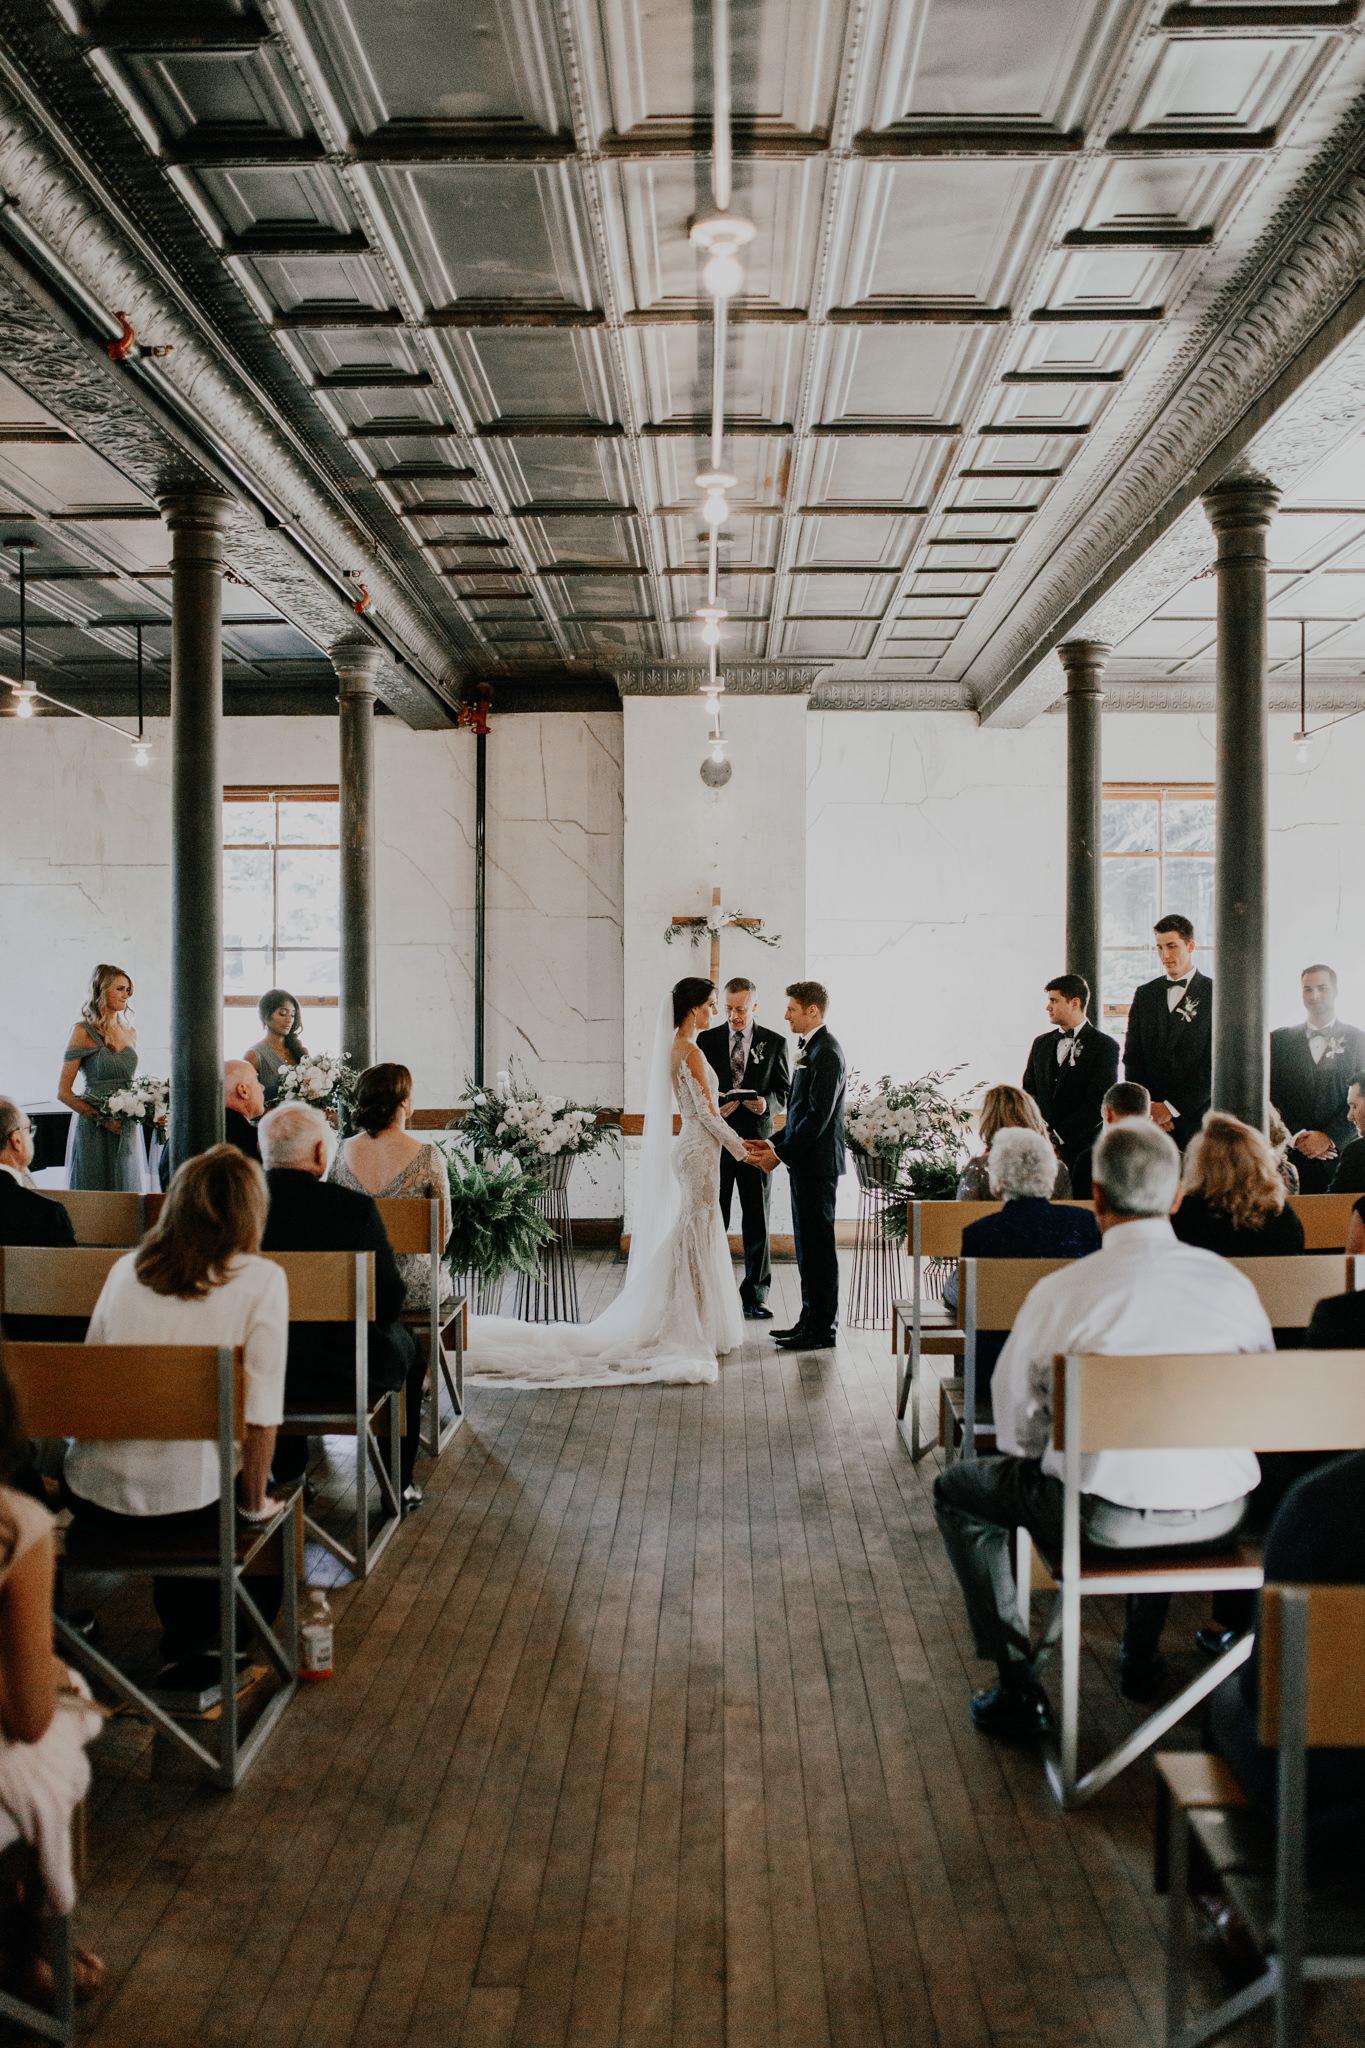 wedding-headlands-center-for-the-arts-sausalito-74.jpg